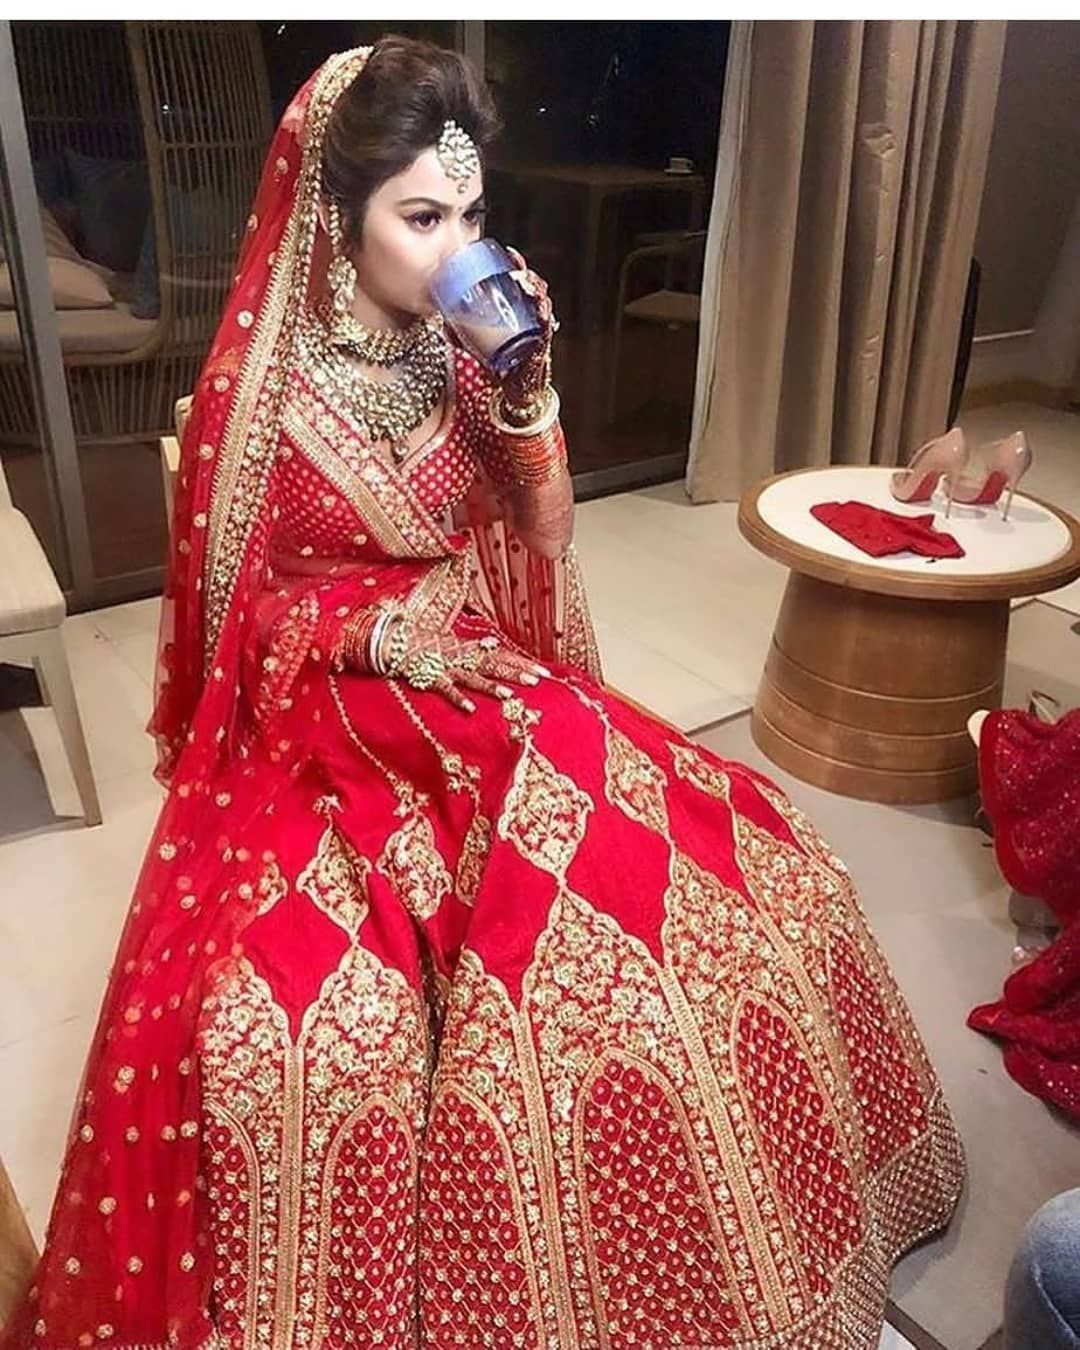 7f0eb4be31bf Cute Bridal in red Dress | Punjabi Bride pics in 2019 | Wedding ...